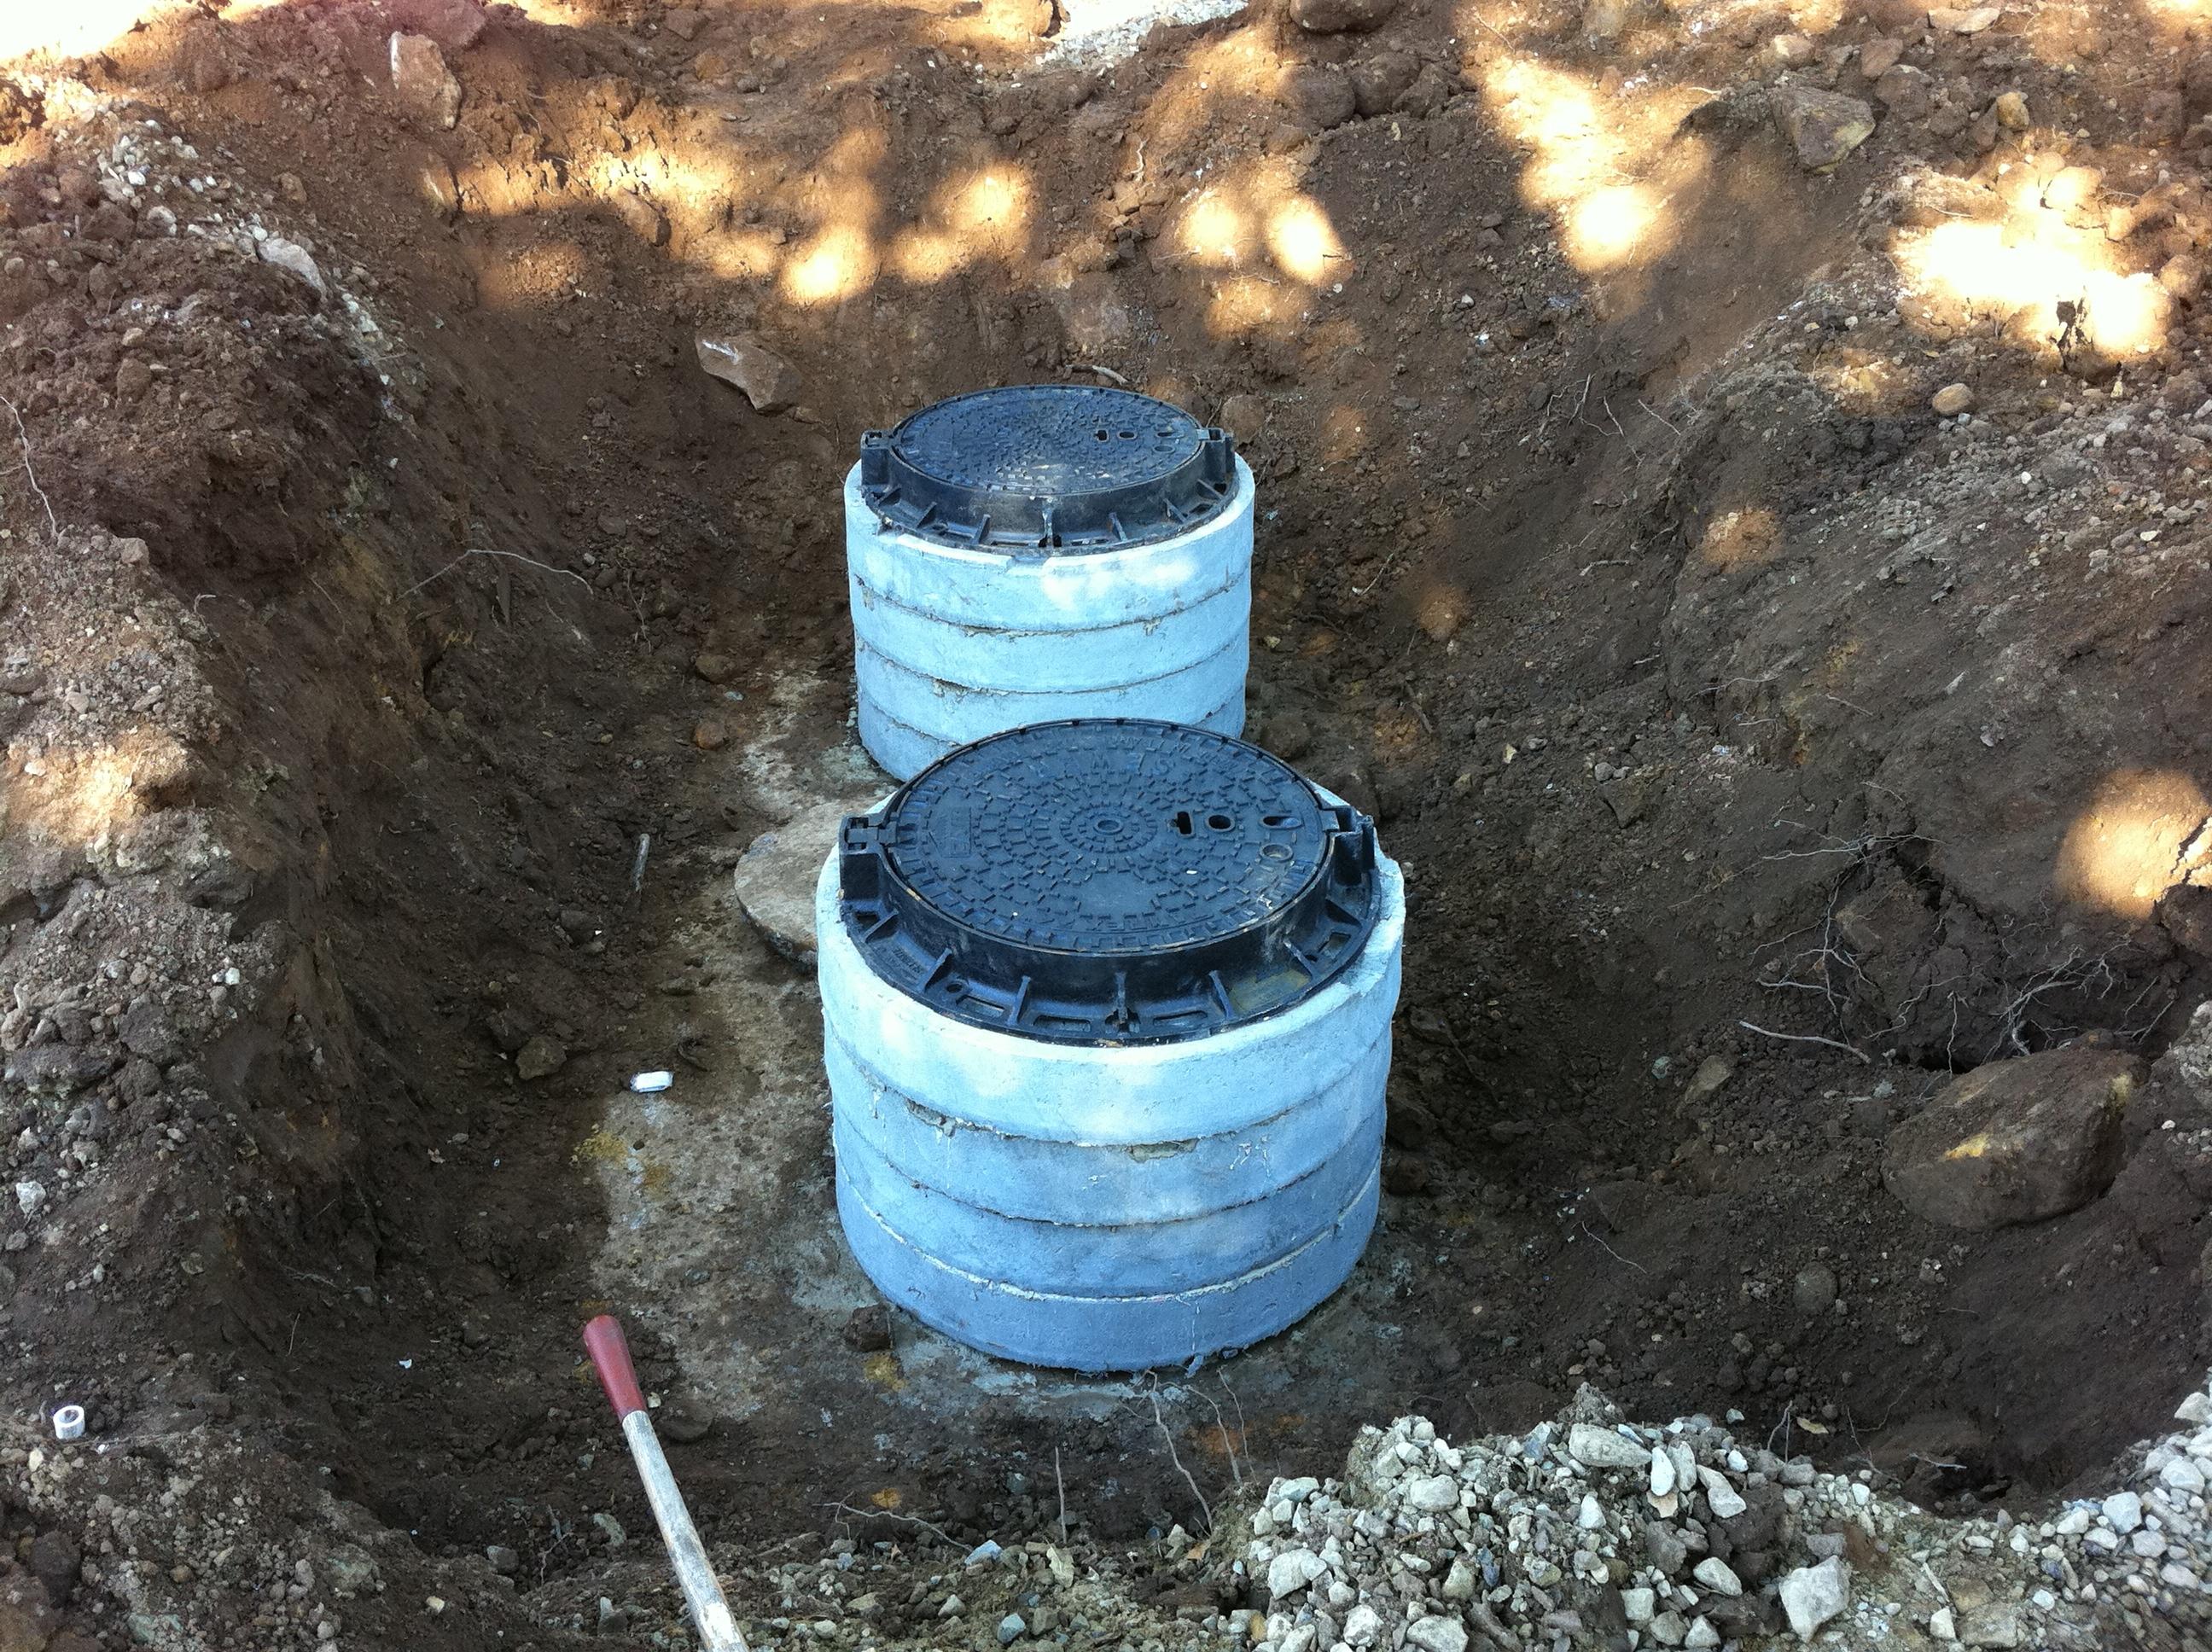 Waterproofing Systems Camarillo : Quick plumbing co of camarillo in ca